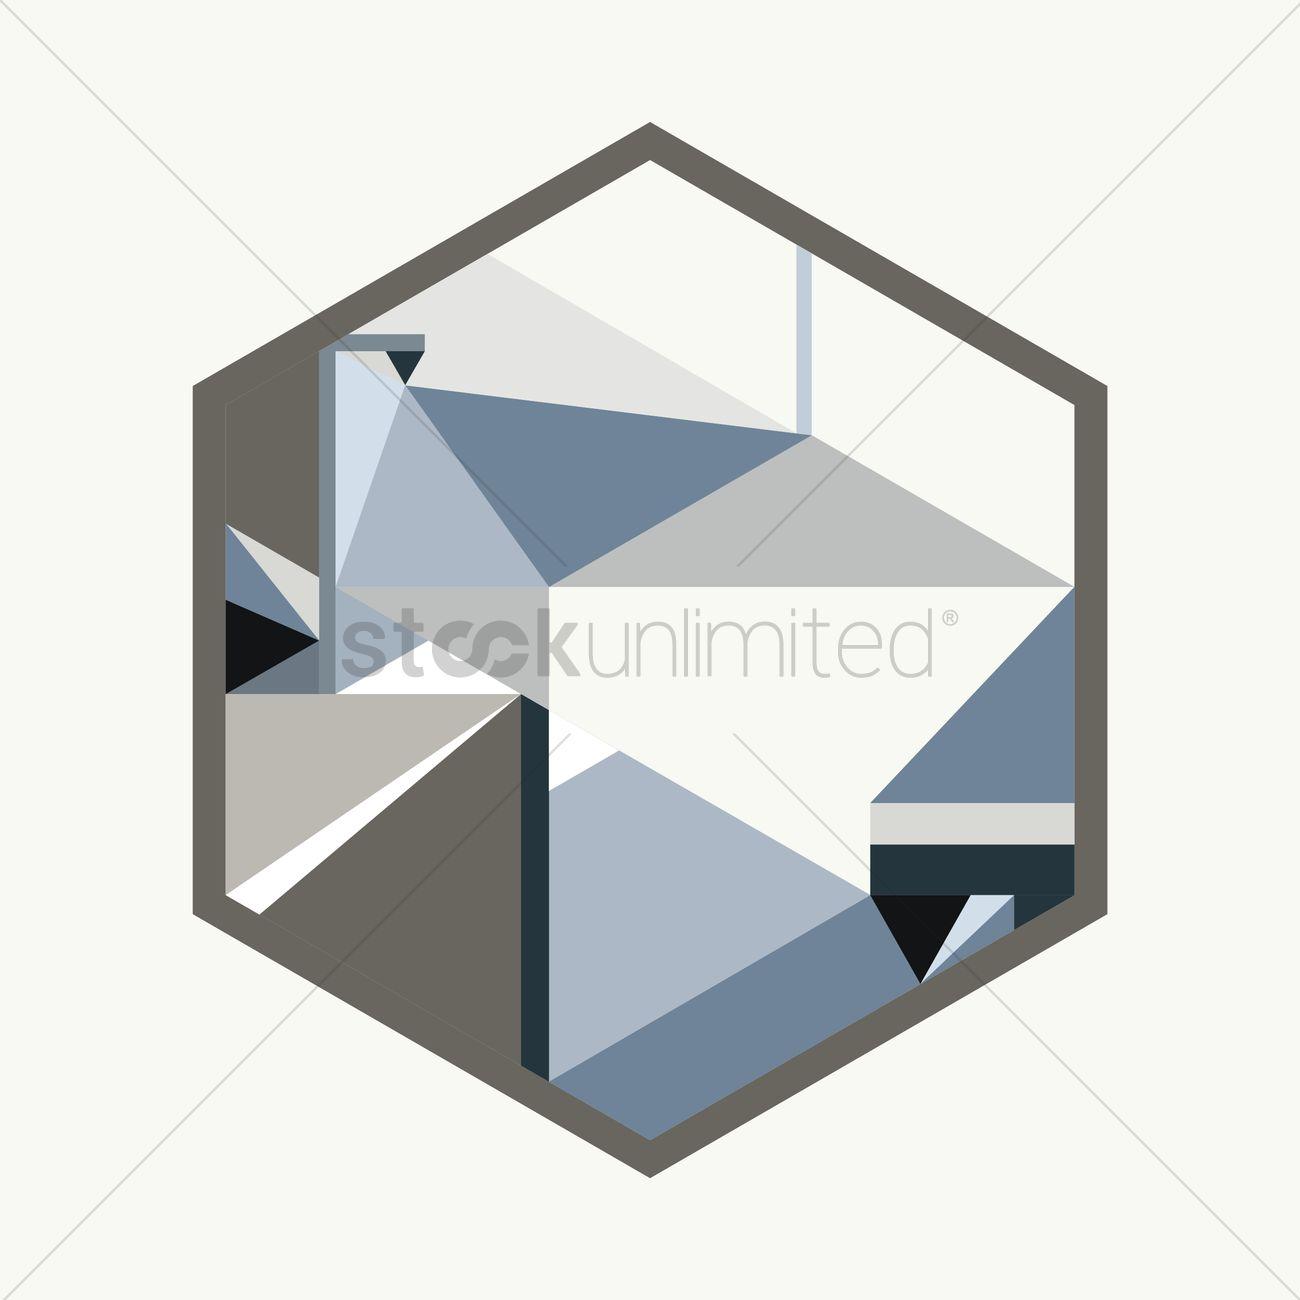 1300x1300 Geometric Design In A Hexagon Vector Image